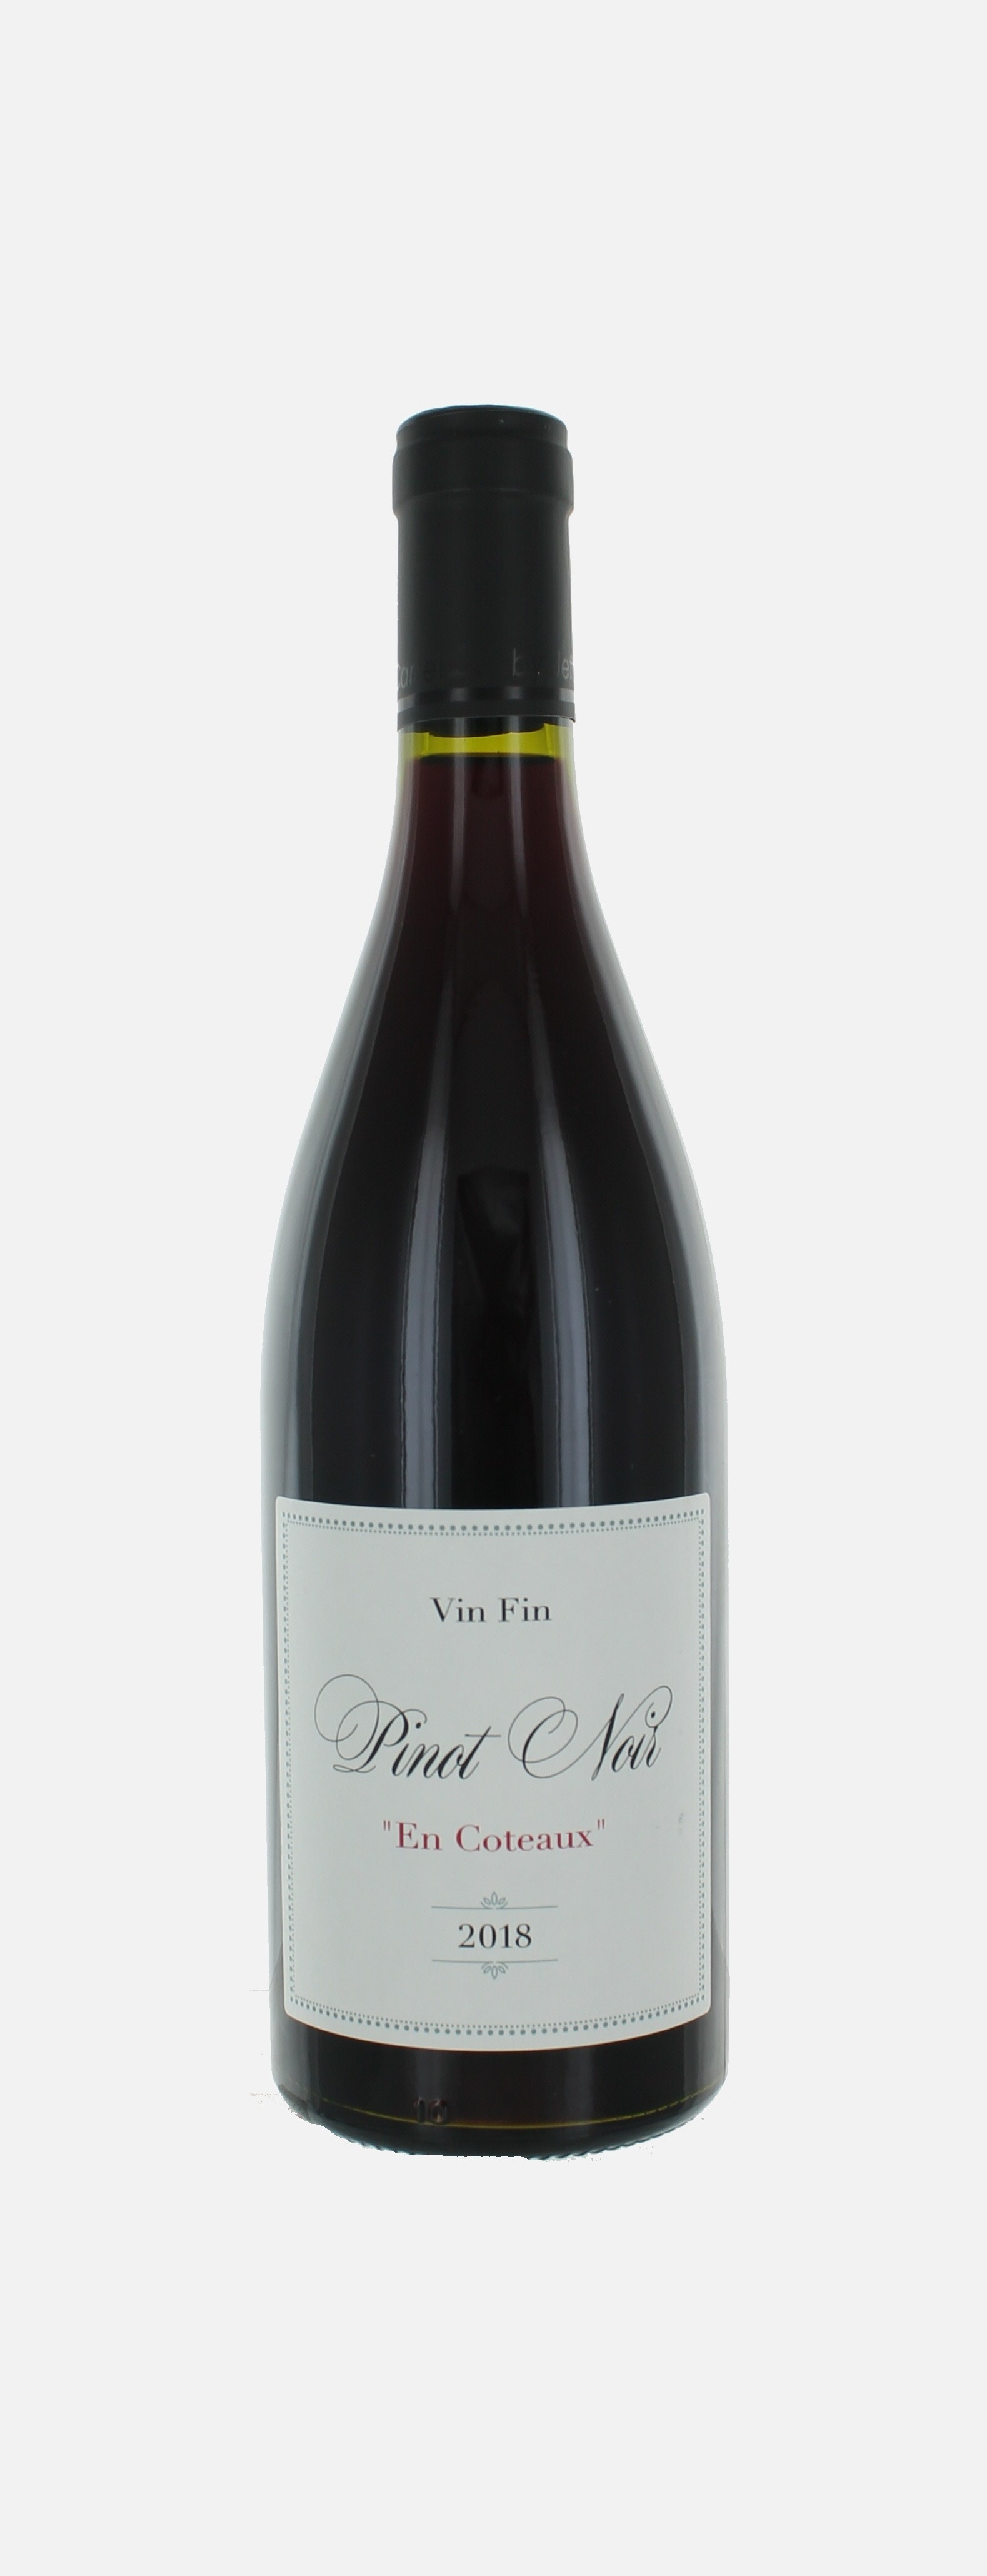 Pinot noir, Pays d'Oc, Jeff Carrel